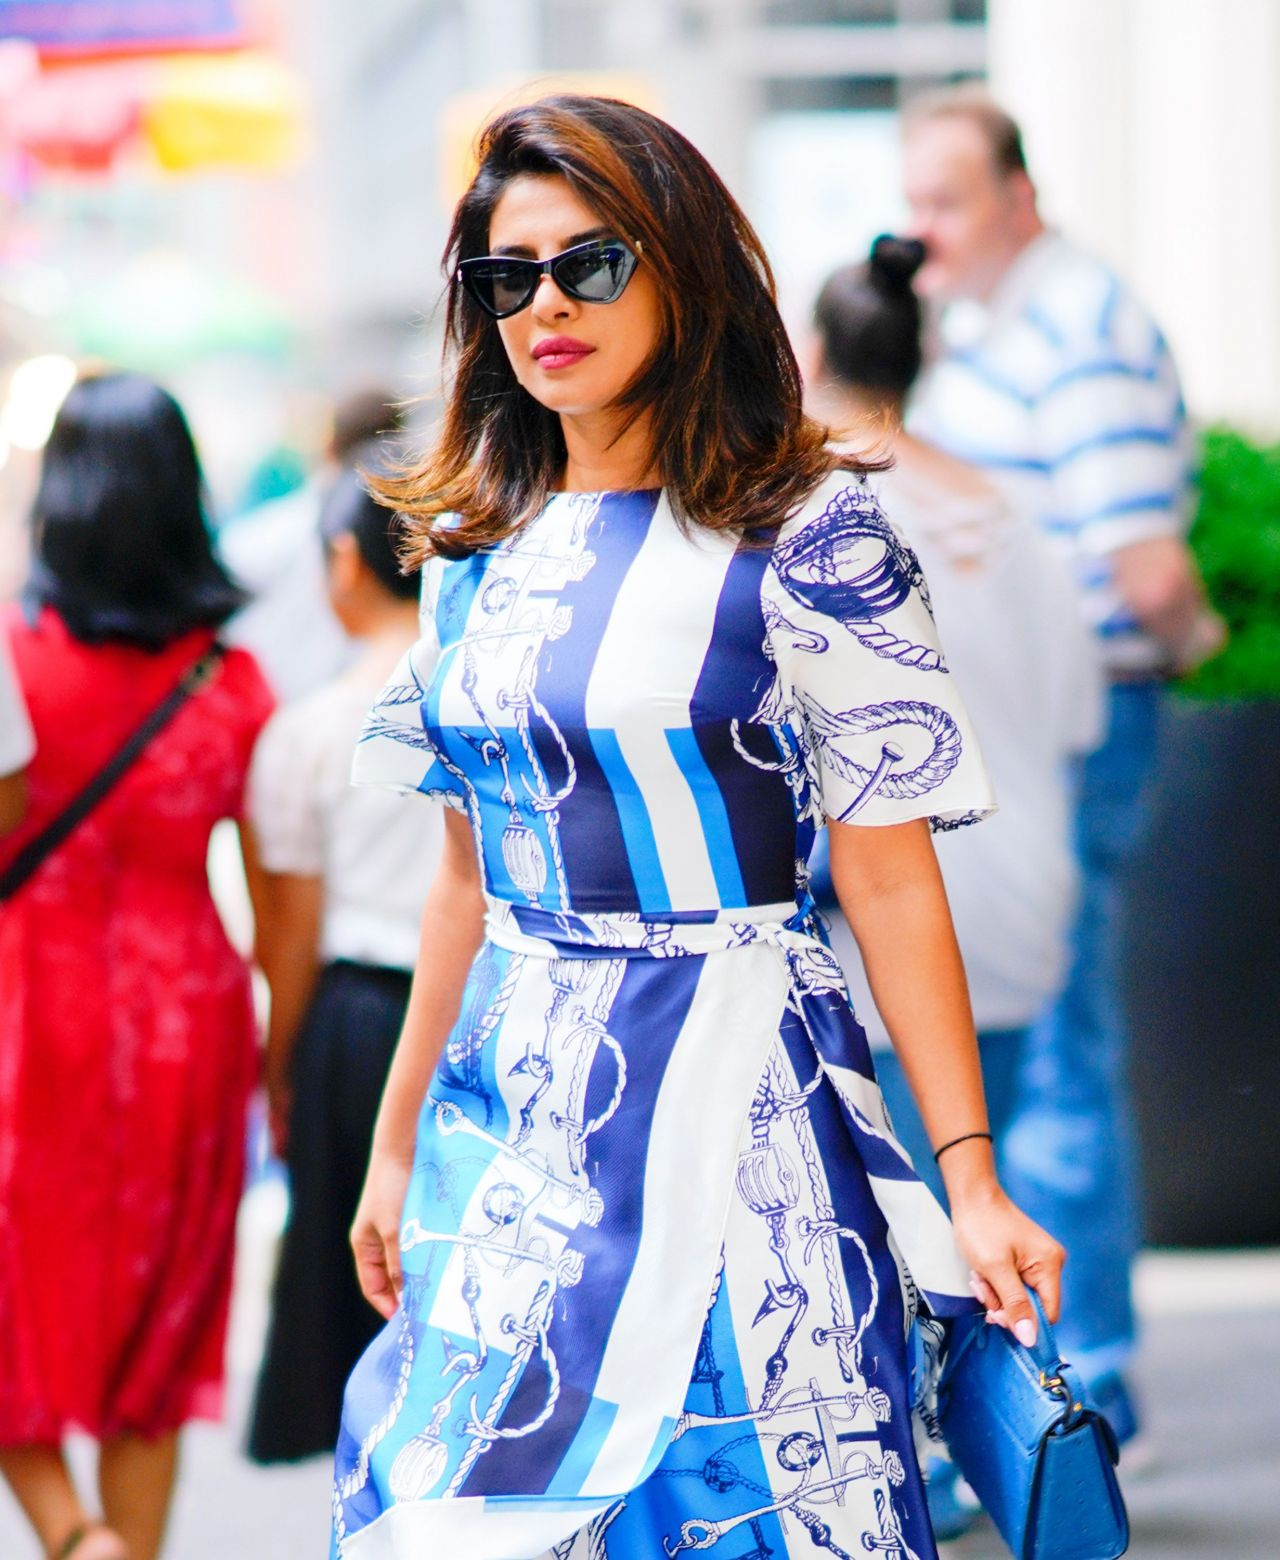 Priyanka Wedding White Gown: Priyanka Chopra In A Blue And White Dress 07/23/2019